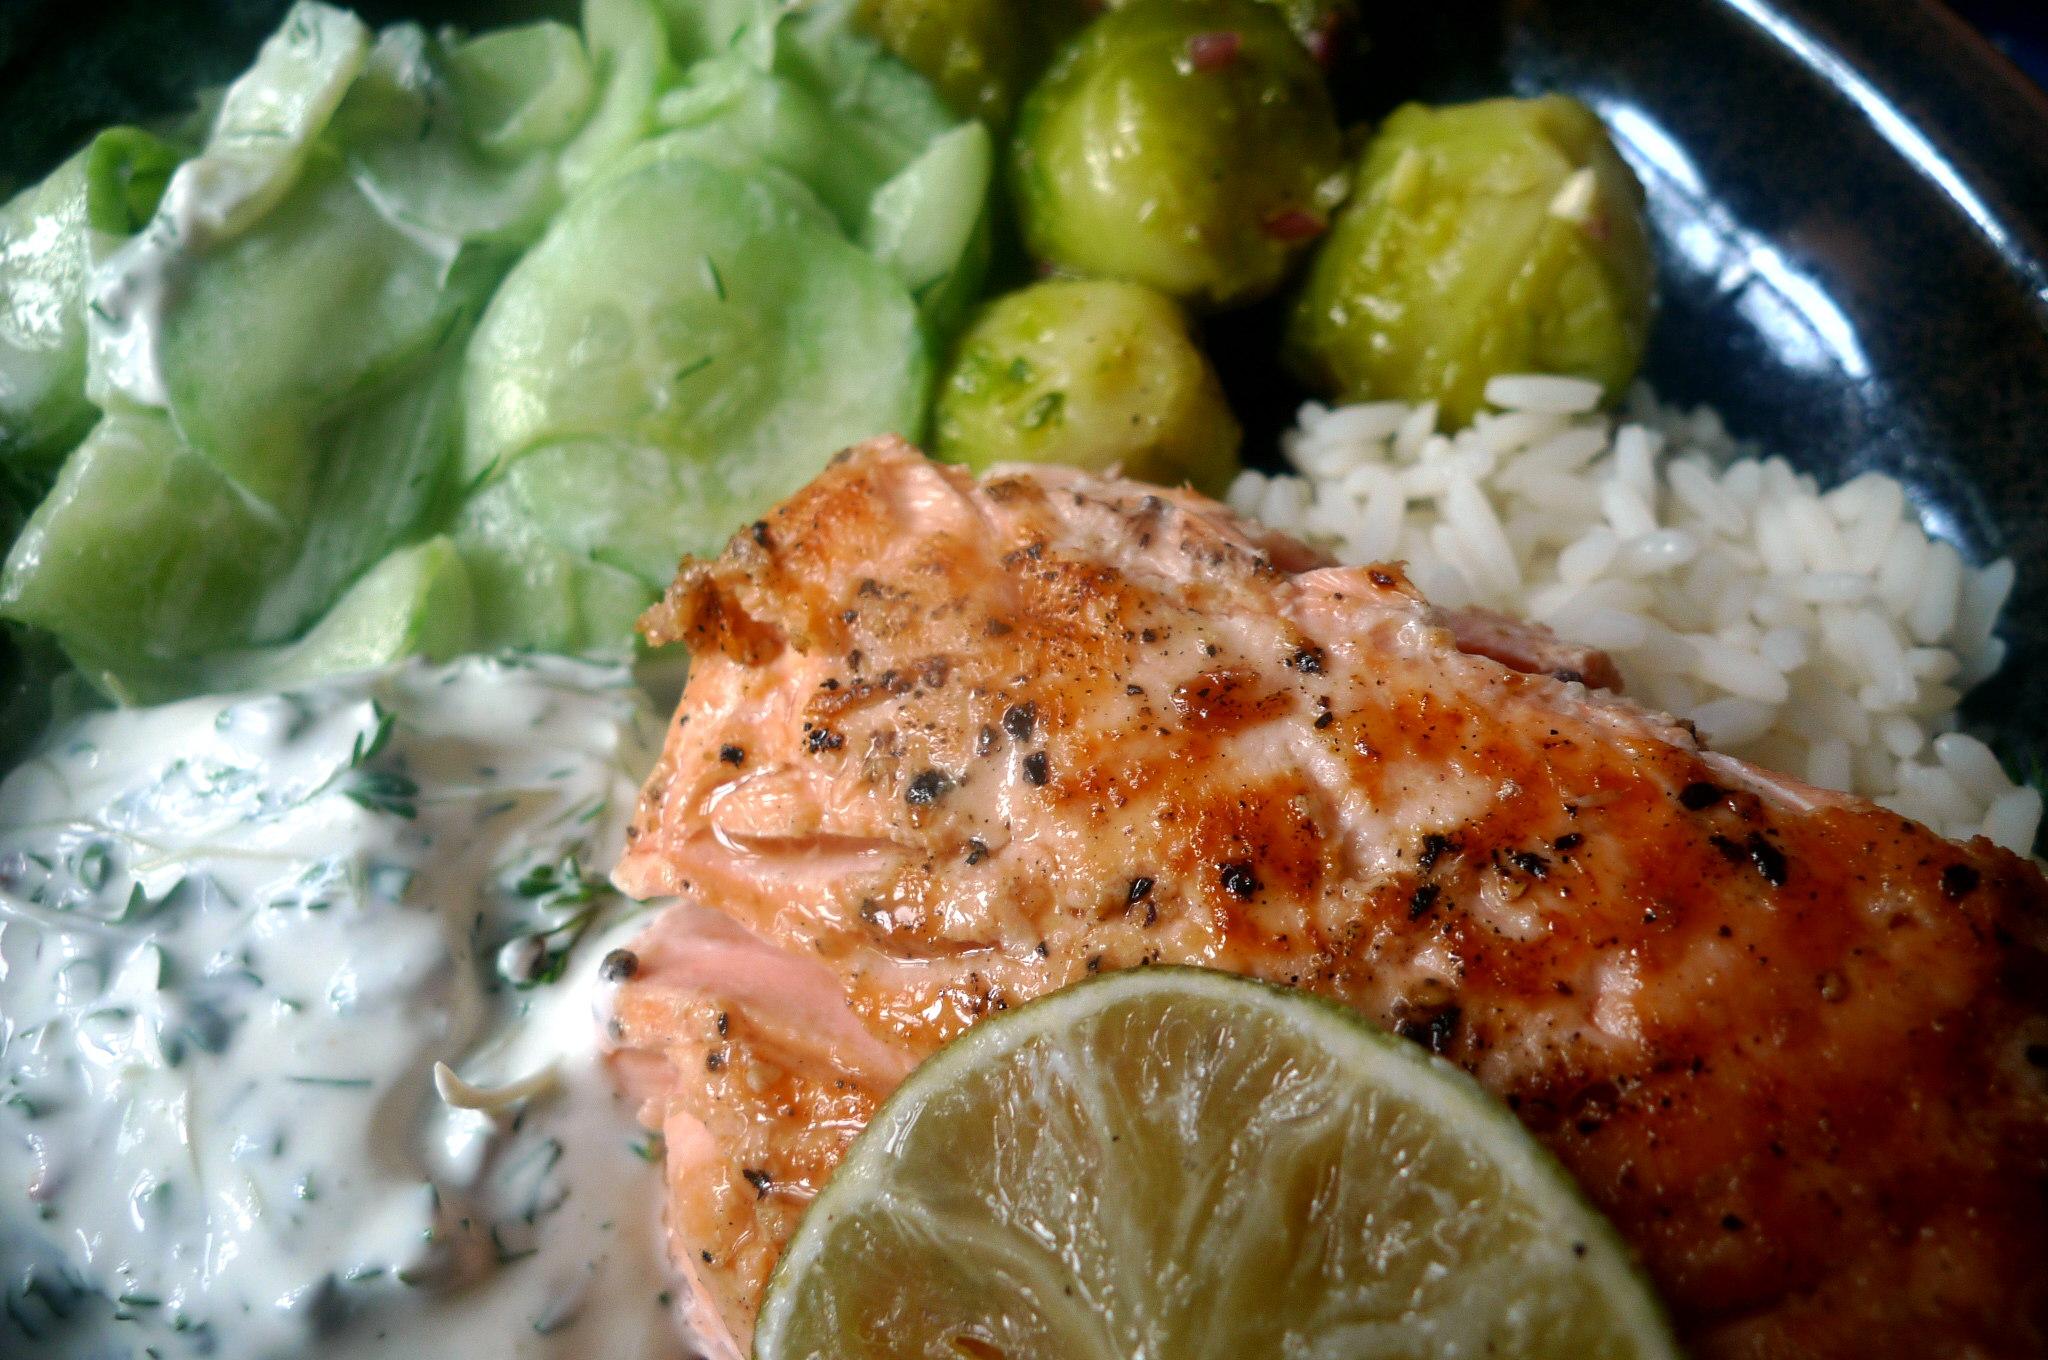 lachsreisrosenkohlsalatgurkensalat-14